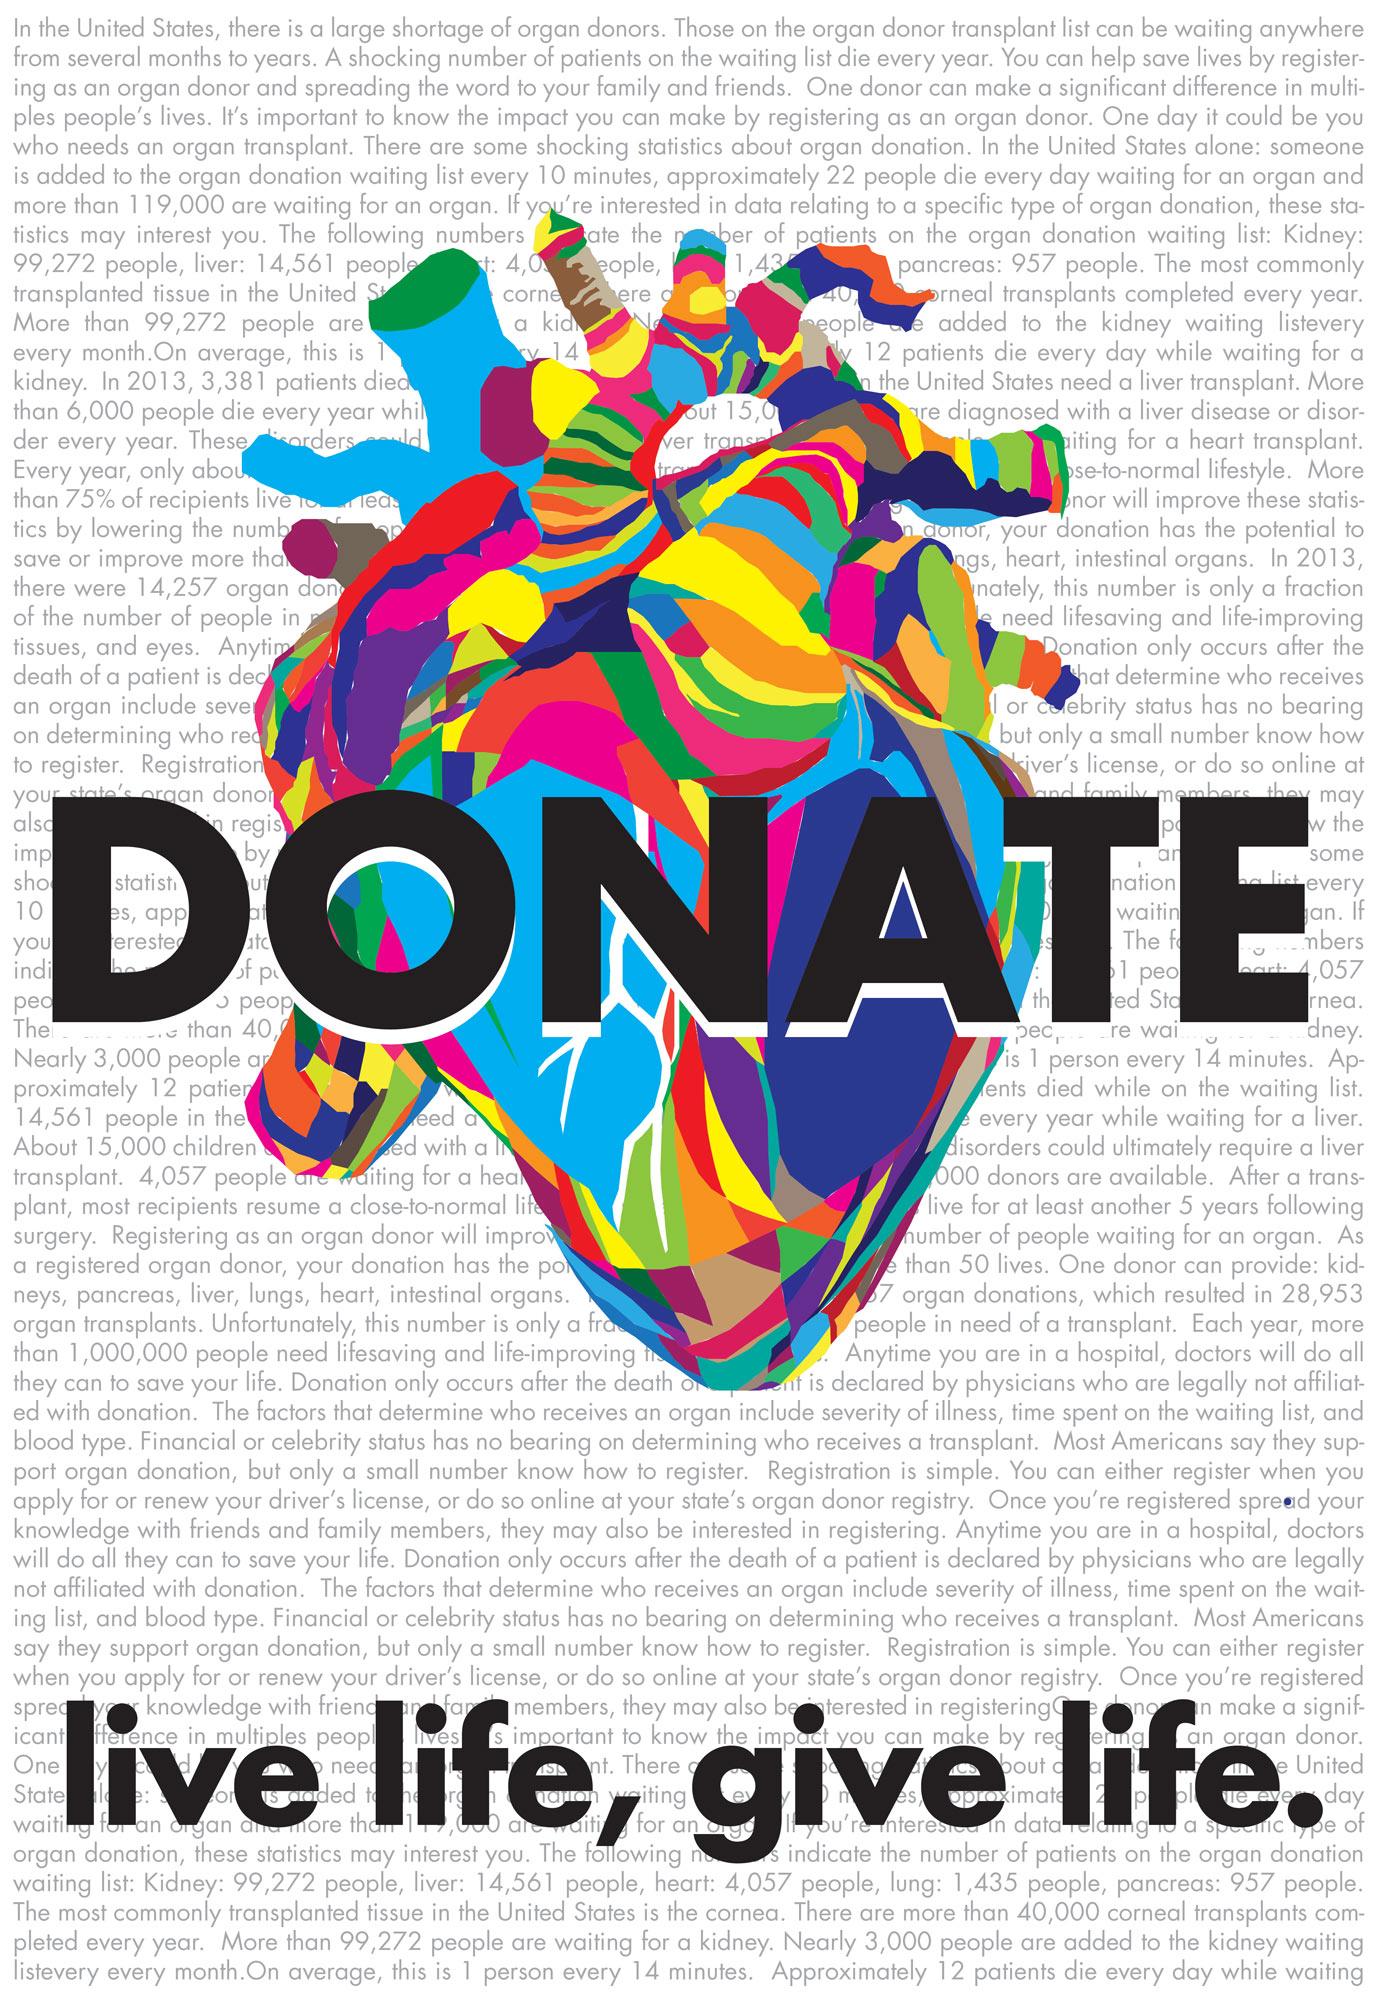 Jodie-Lavigne-persuasive-poster-donate